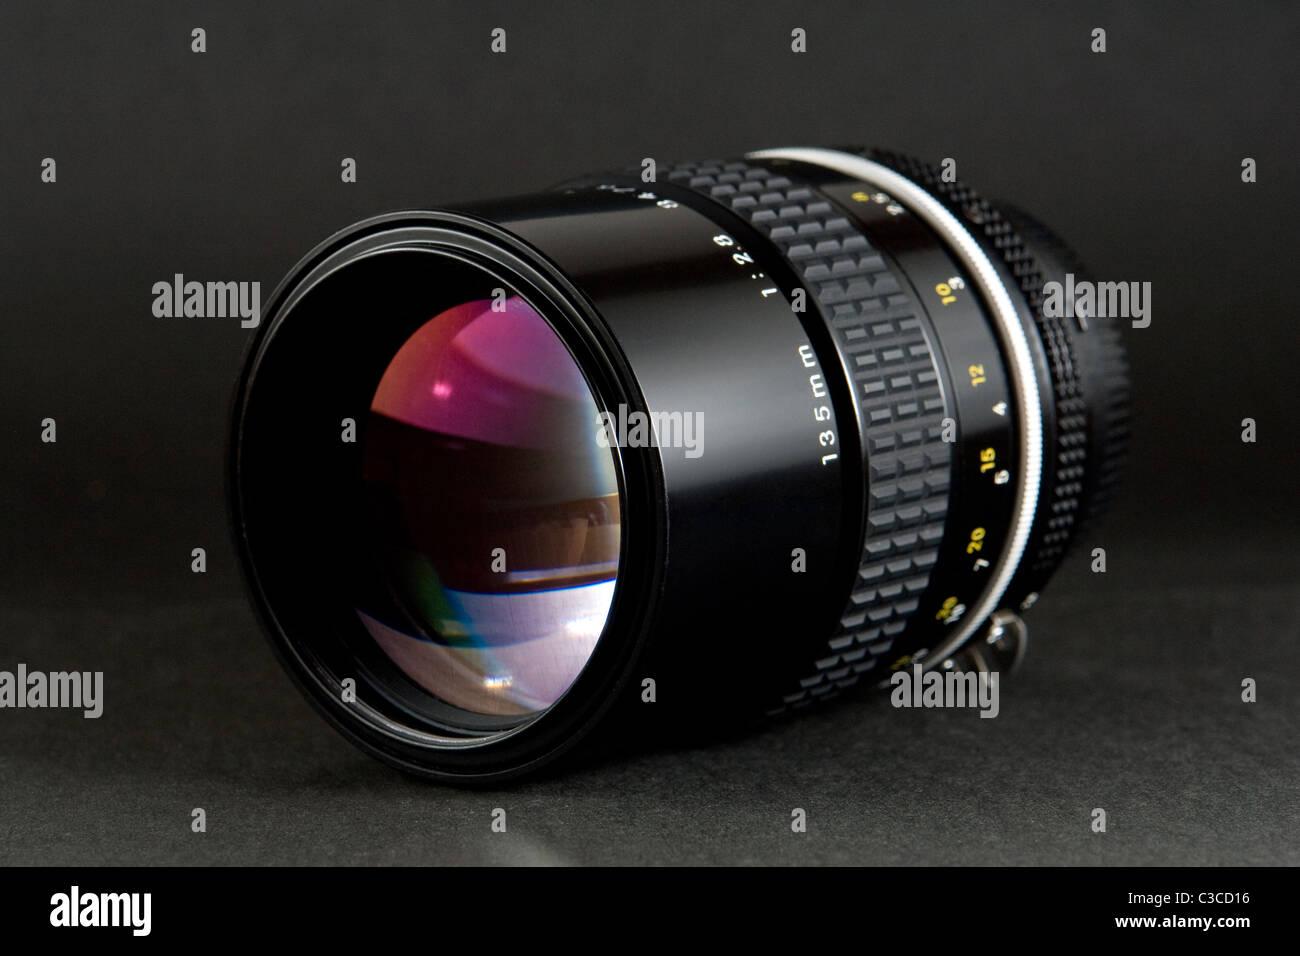 High Quality Professional DSLR Prime Lens - Stock Image